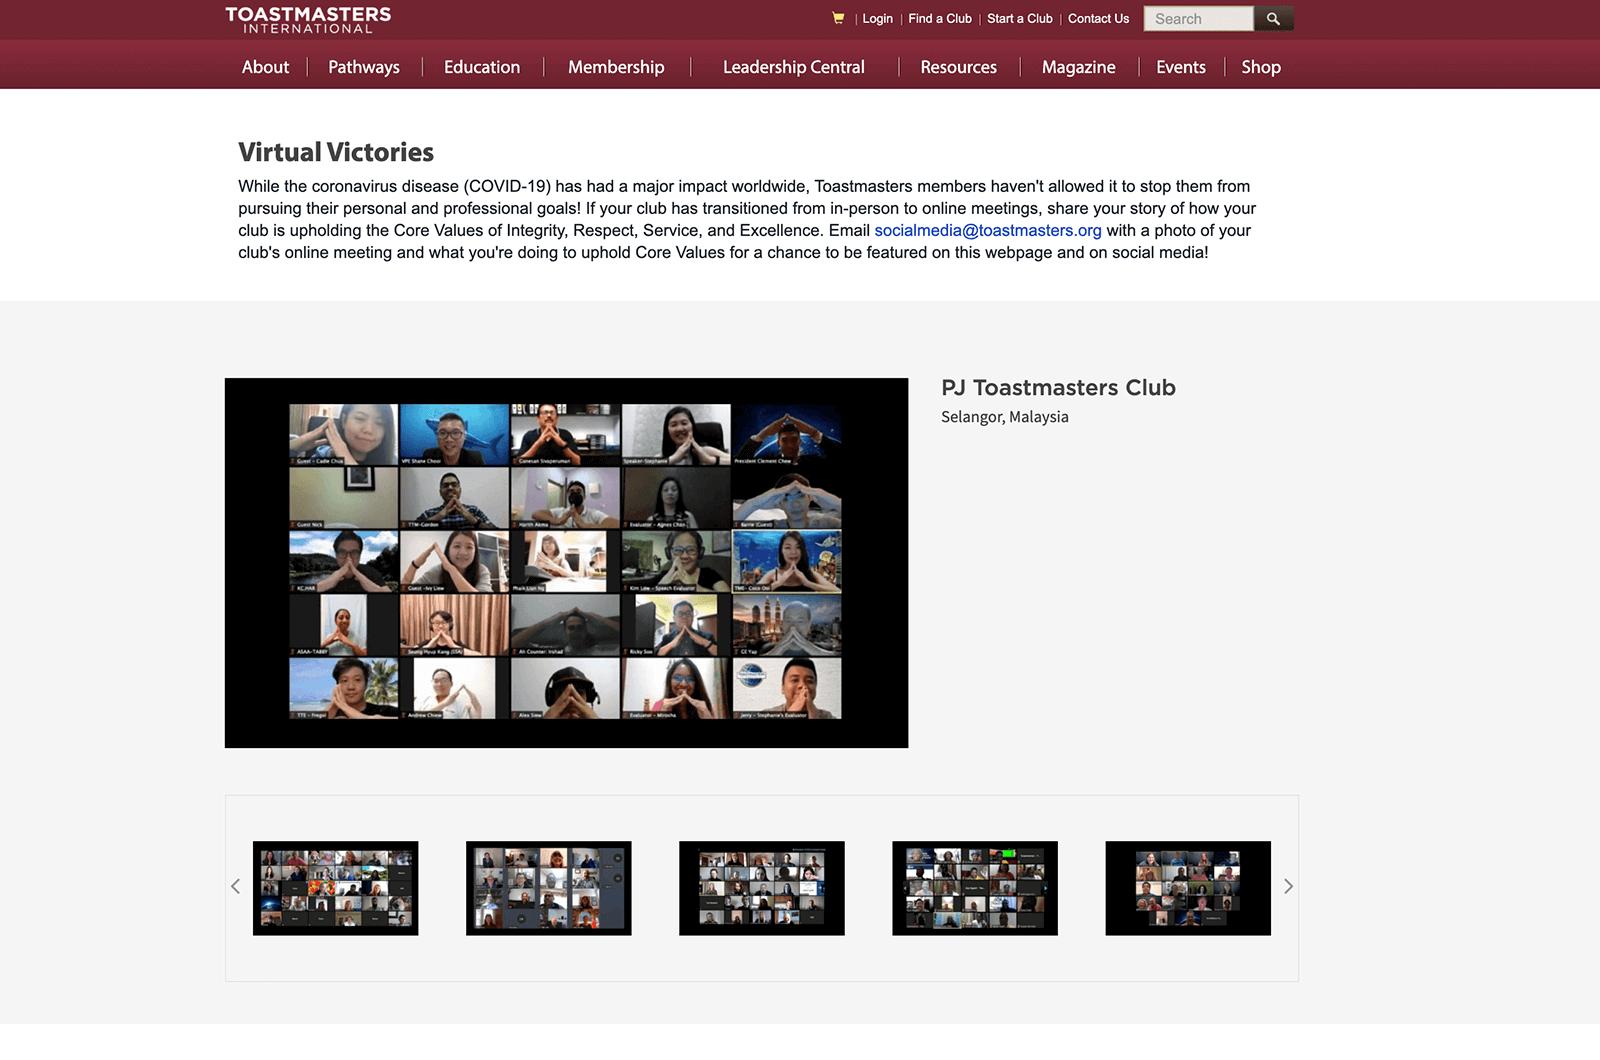 Image of Toastmasters webpage showing photos of people in Zoom meetings